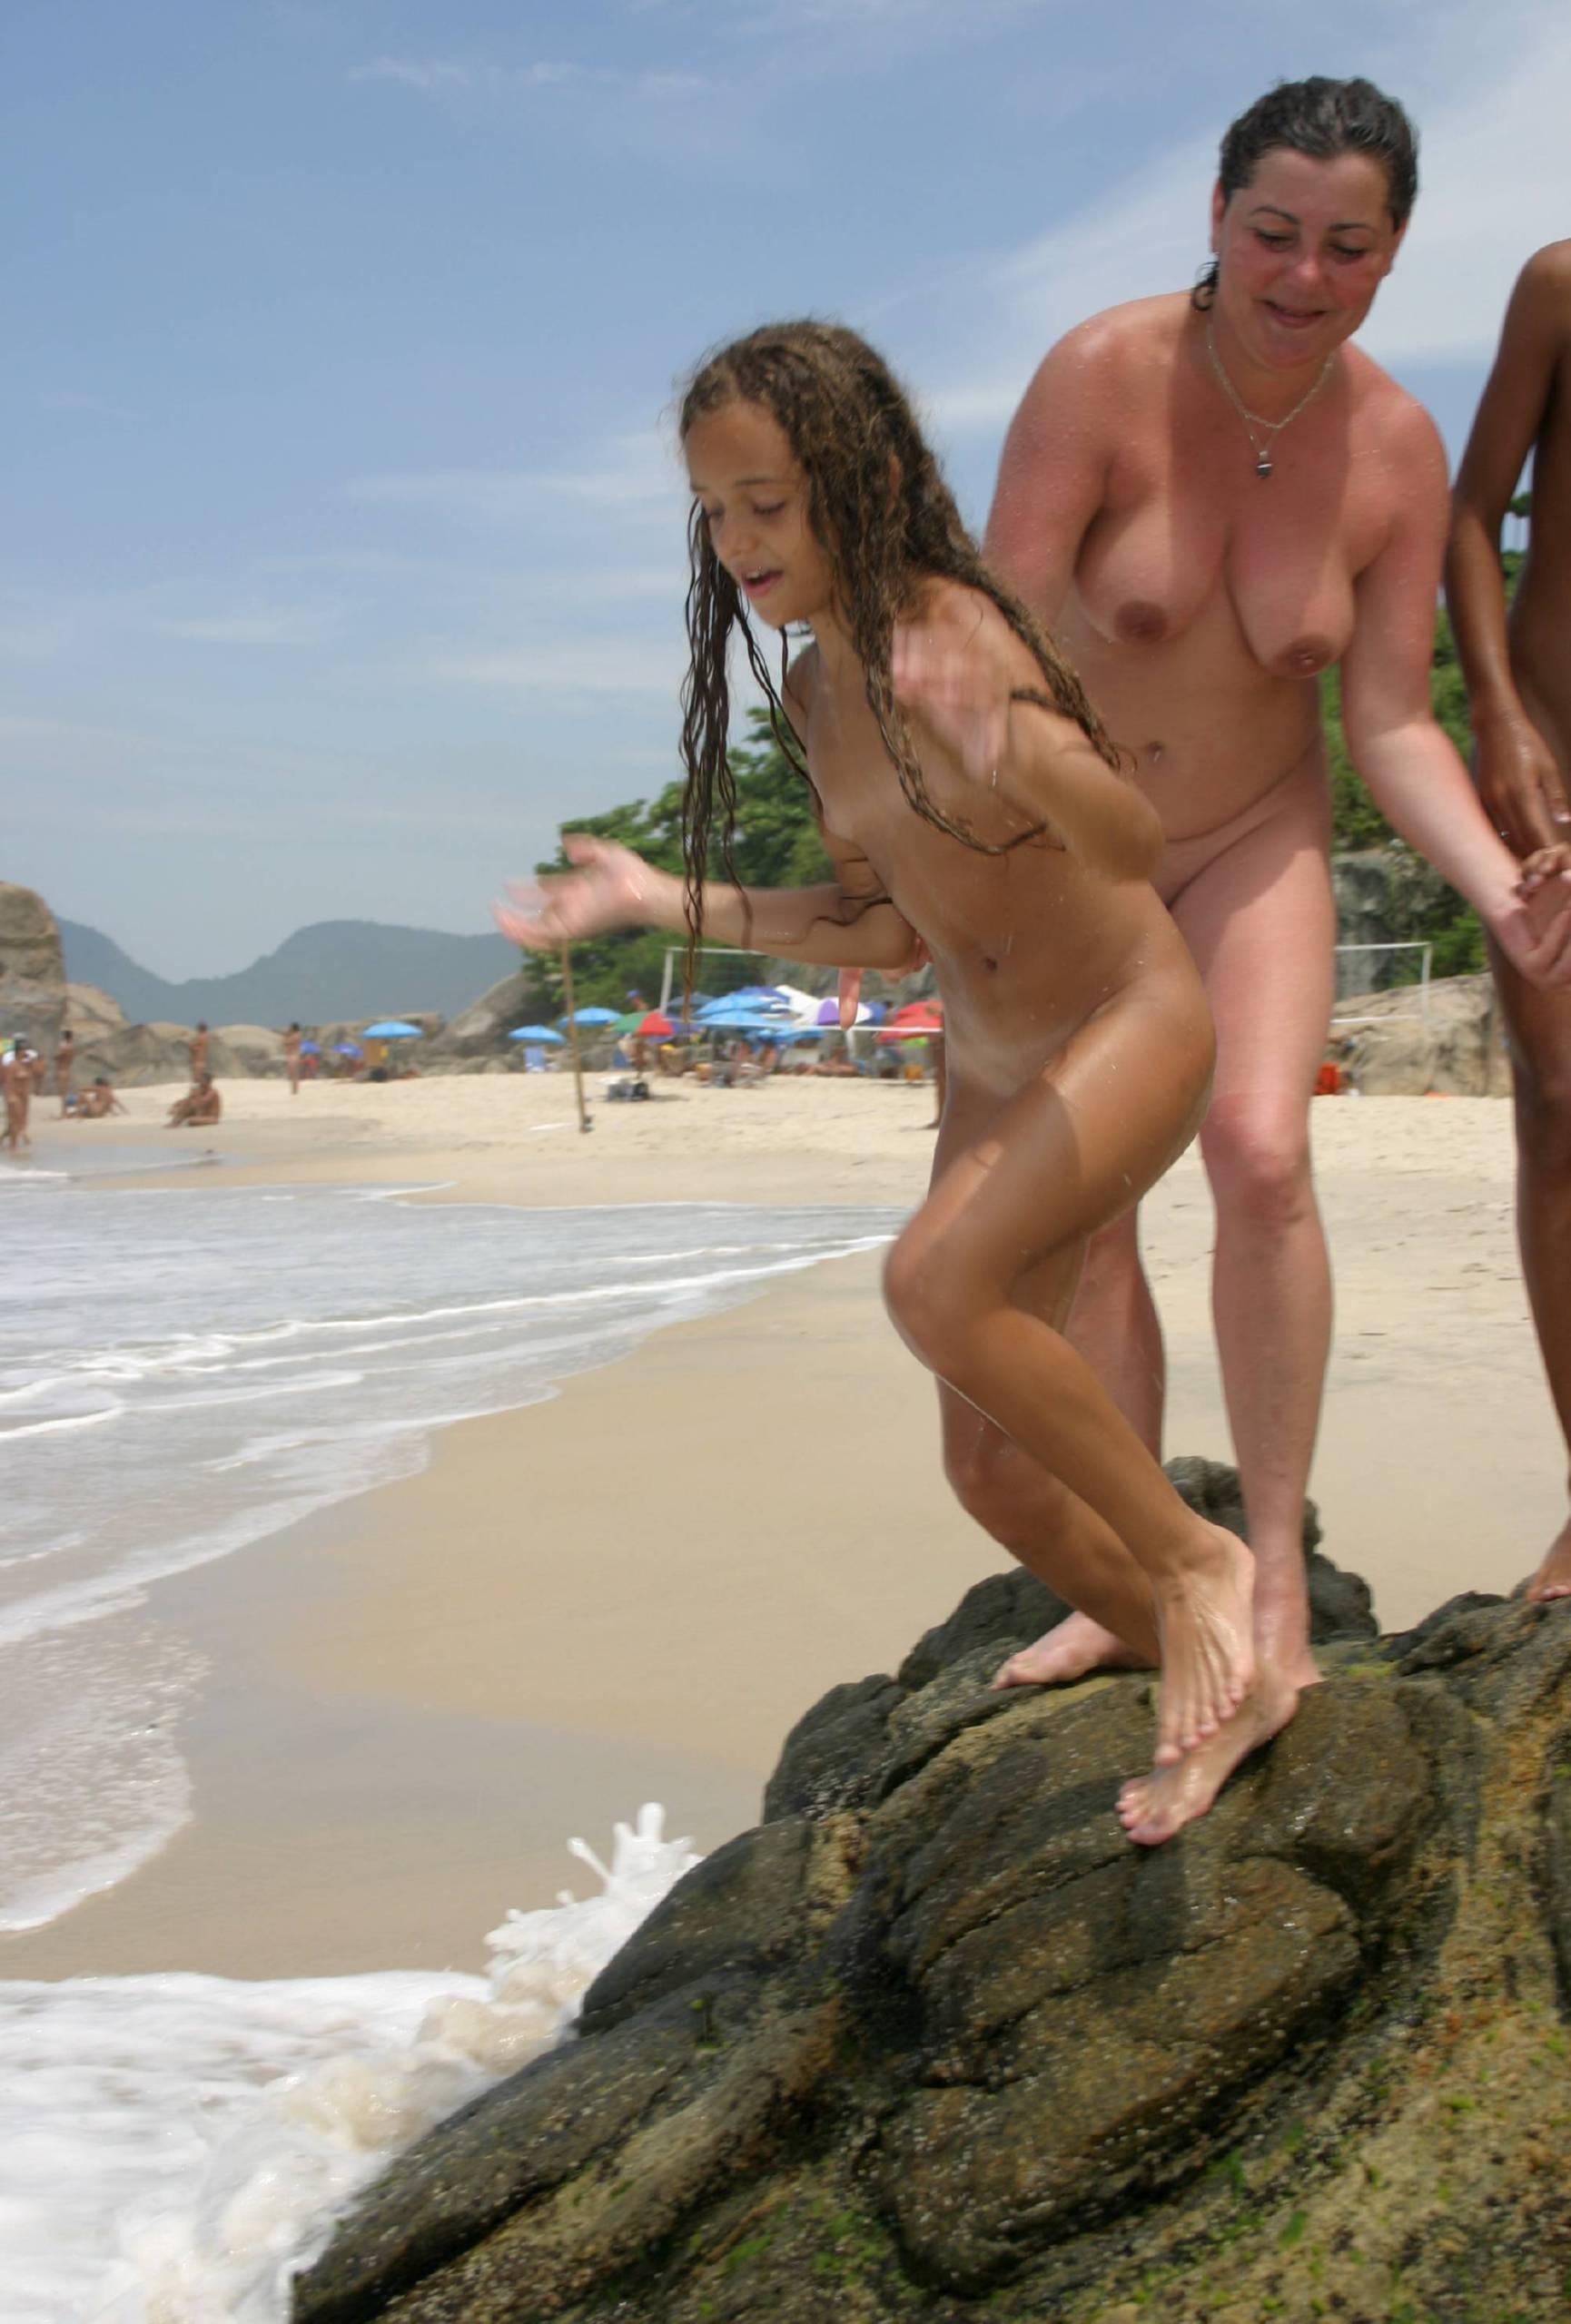 Purenudism Images Brazilian Rock Cliffs Climb - 2